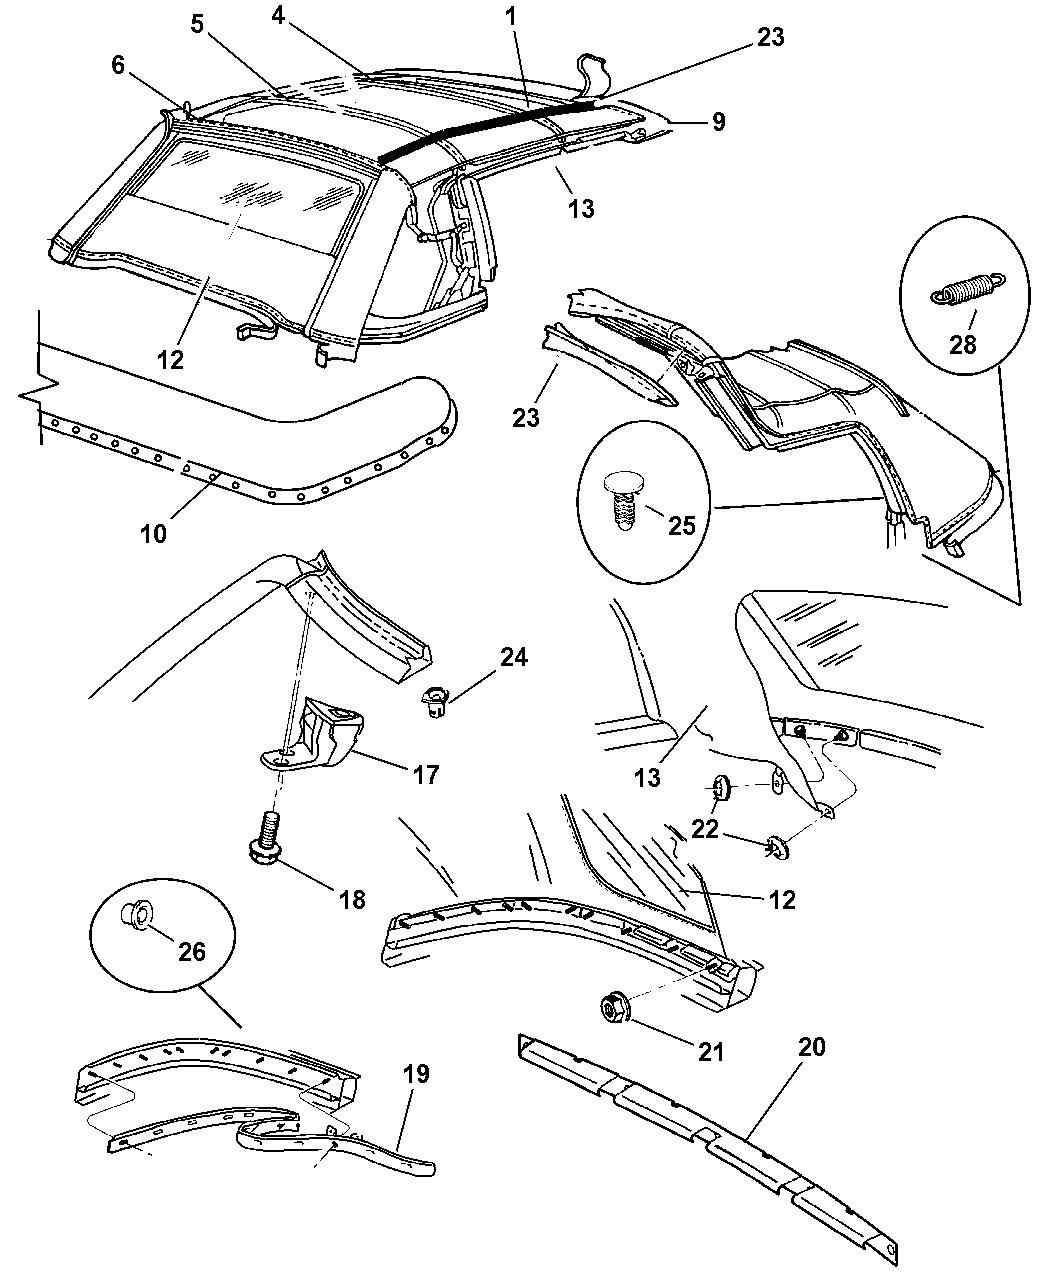 Genuine Chrysler PLUG-FOLDING TOP MOTOR